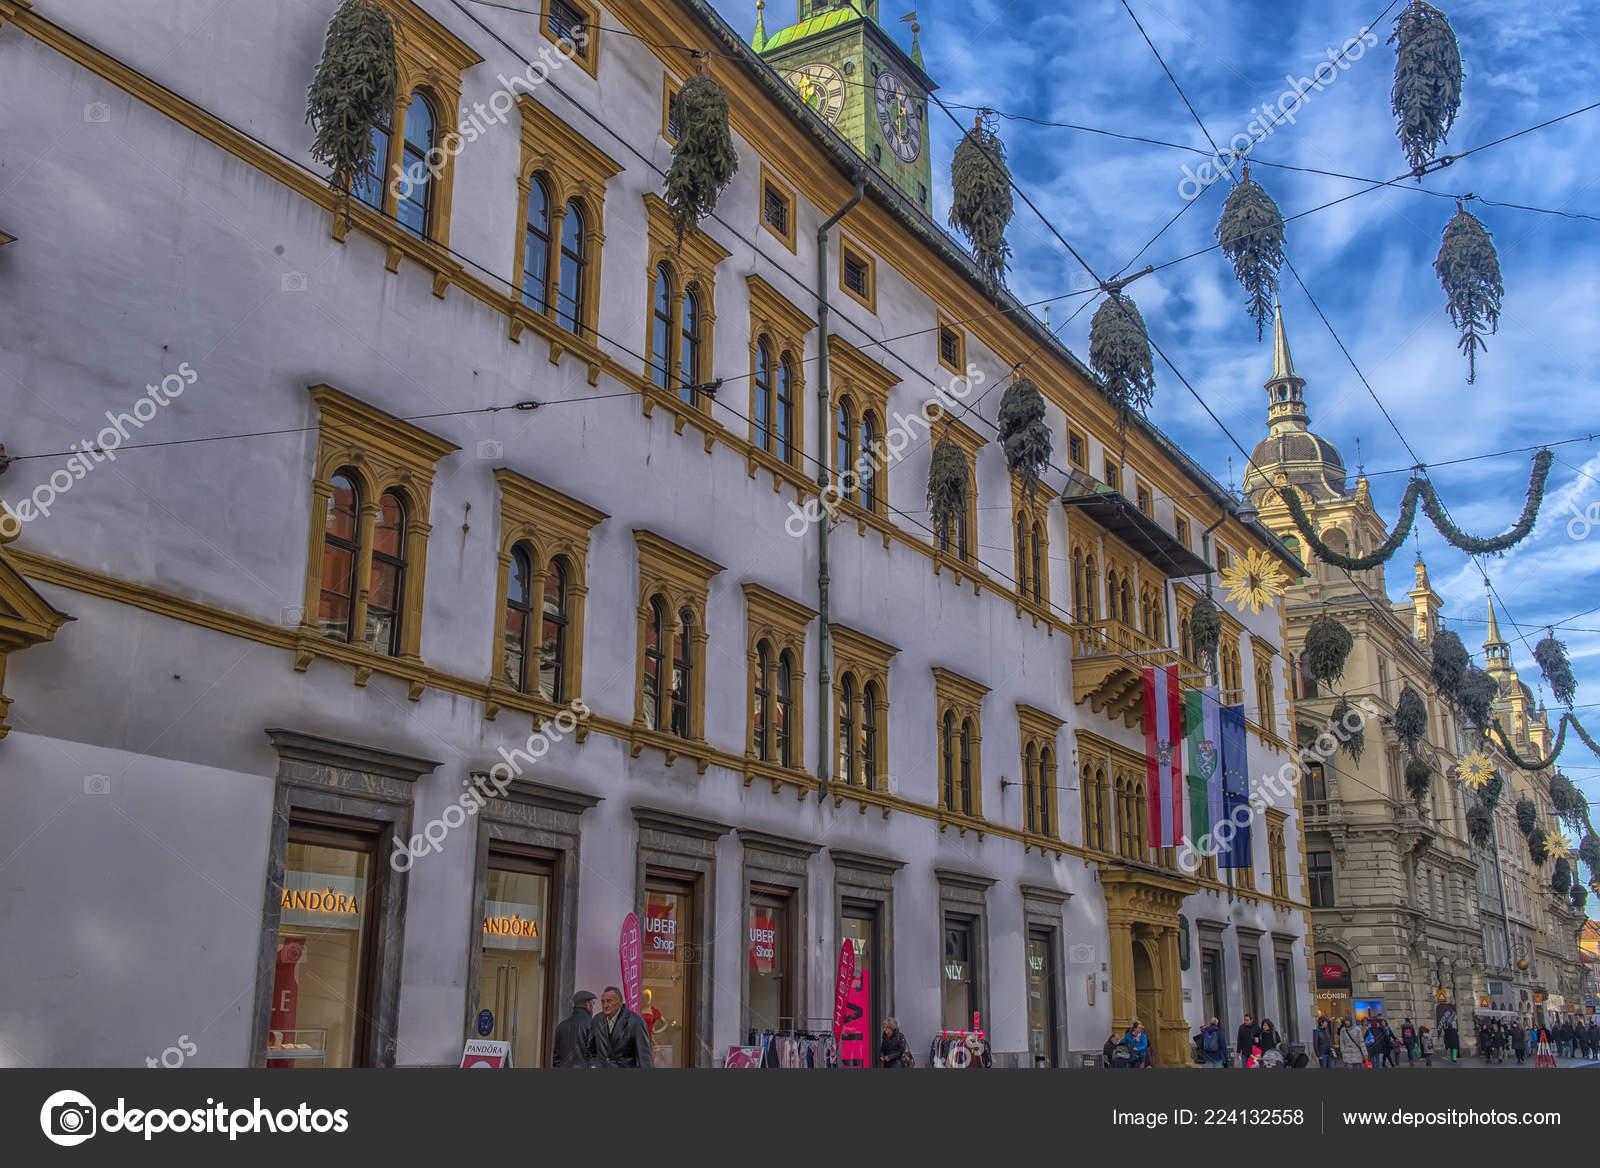 Christmas In Austria Holidays.Graz Austria 2018 Christmas Decorations Streets Graz Advent